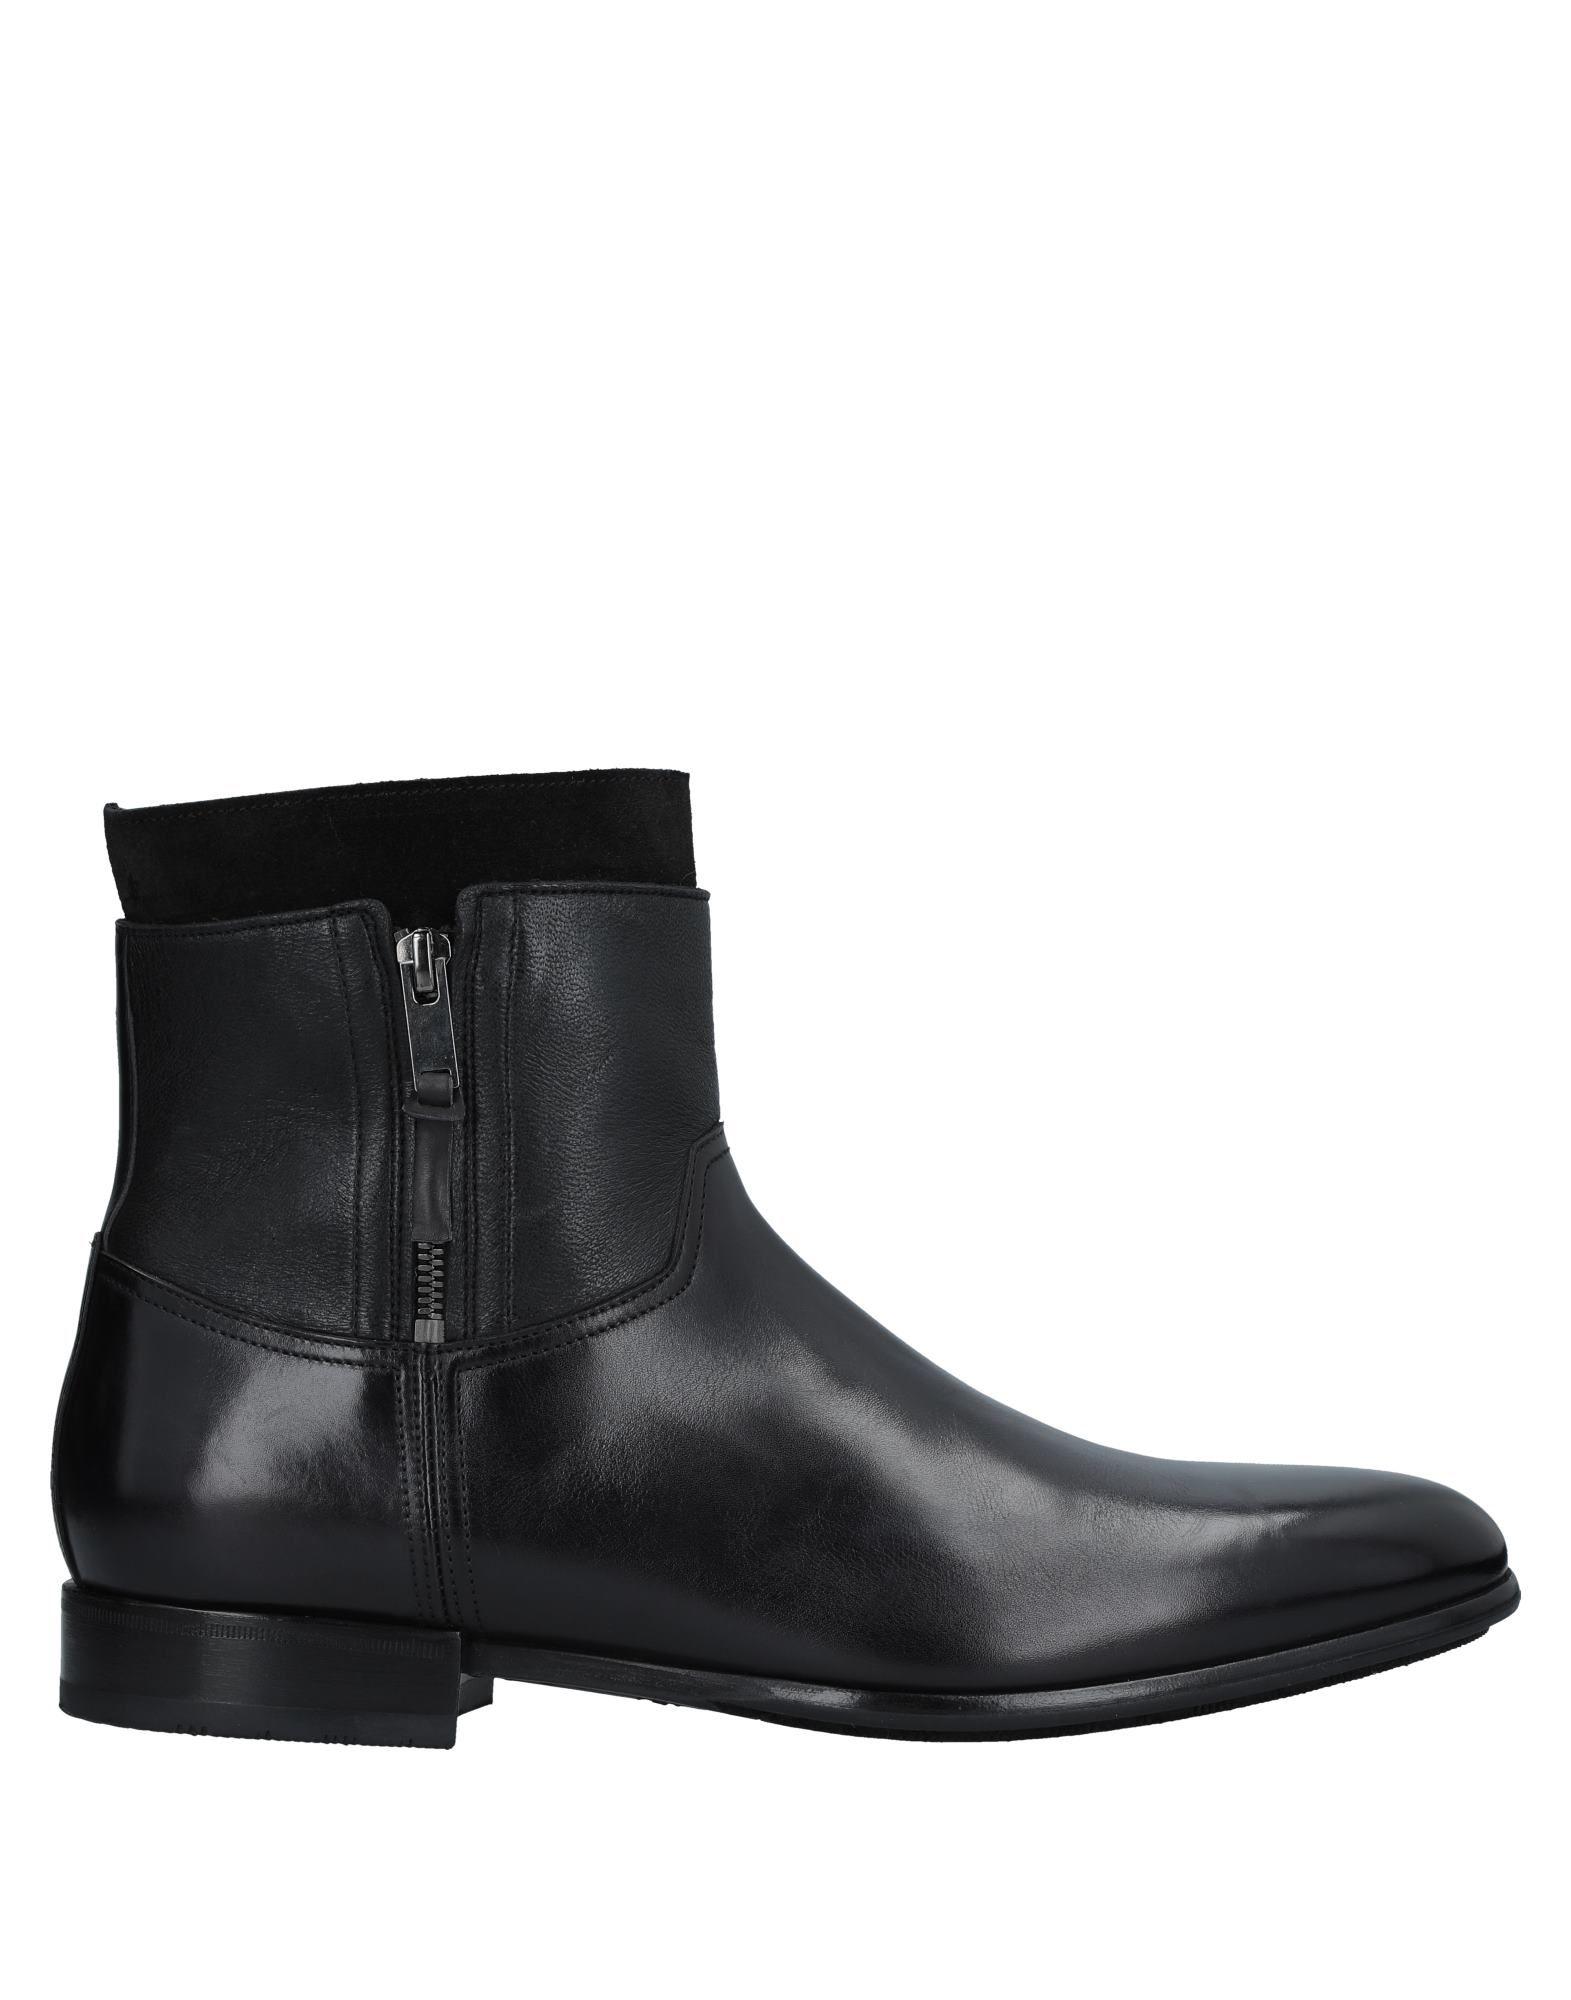 Santoni Schuhe Stiefelette Herren  11519964NP Gute Qualität beliebte Schuhe Santoni 96a49b